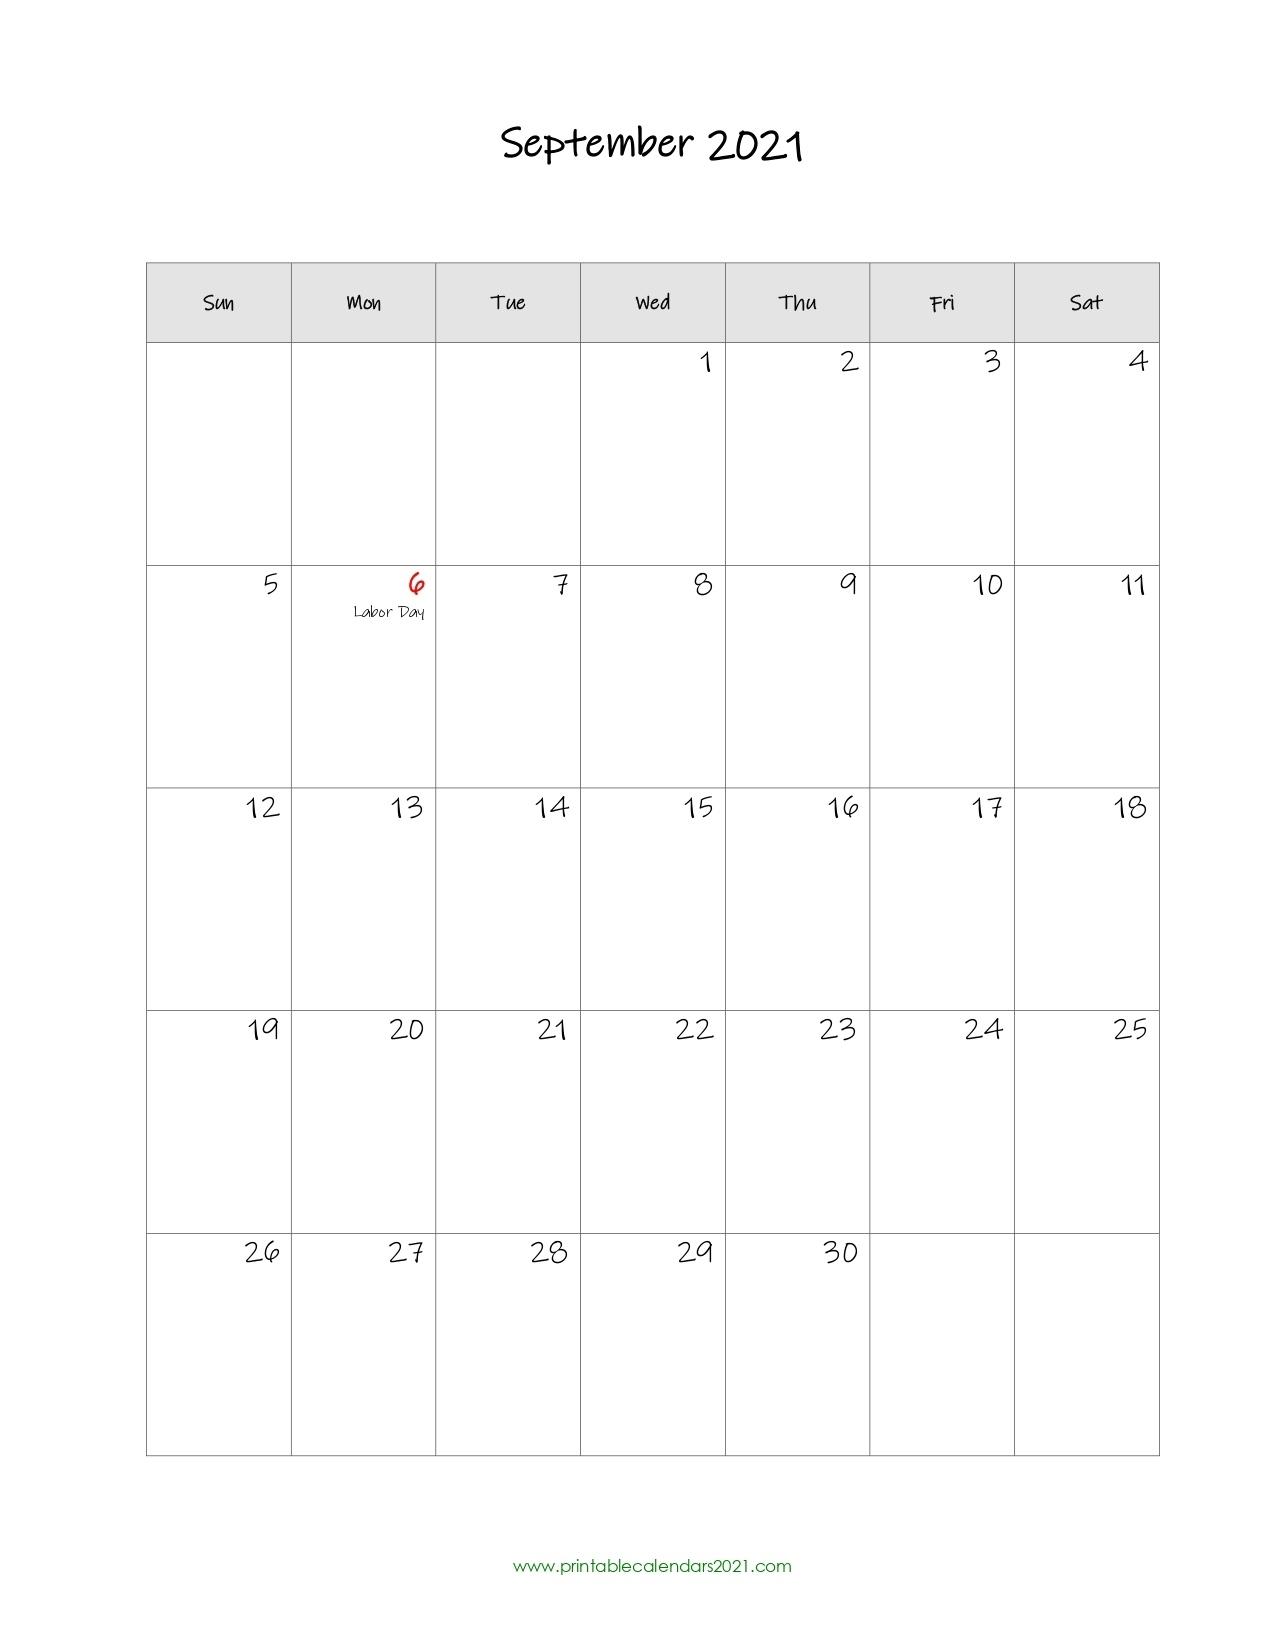 Printable Calendar September 2021, Printable 2021 Calendar With Holidays Printable Calendar September 2020 To September 2021